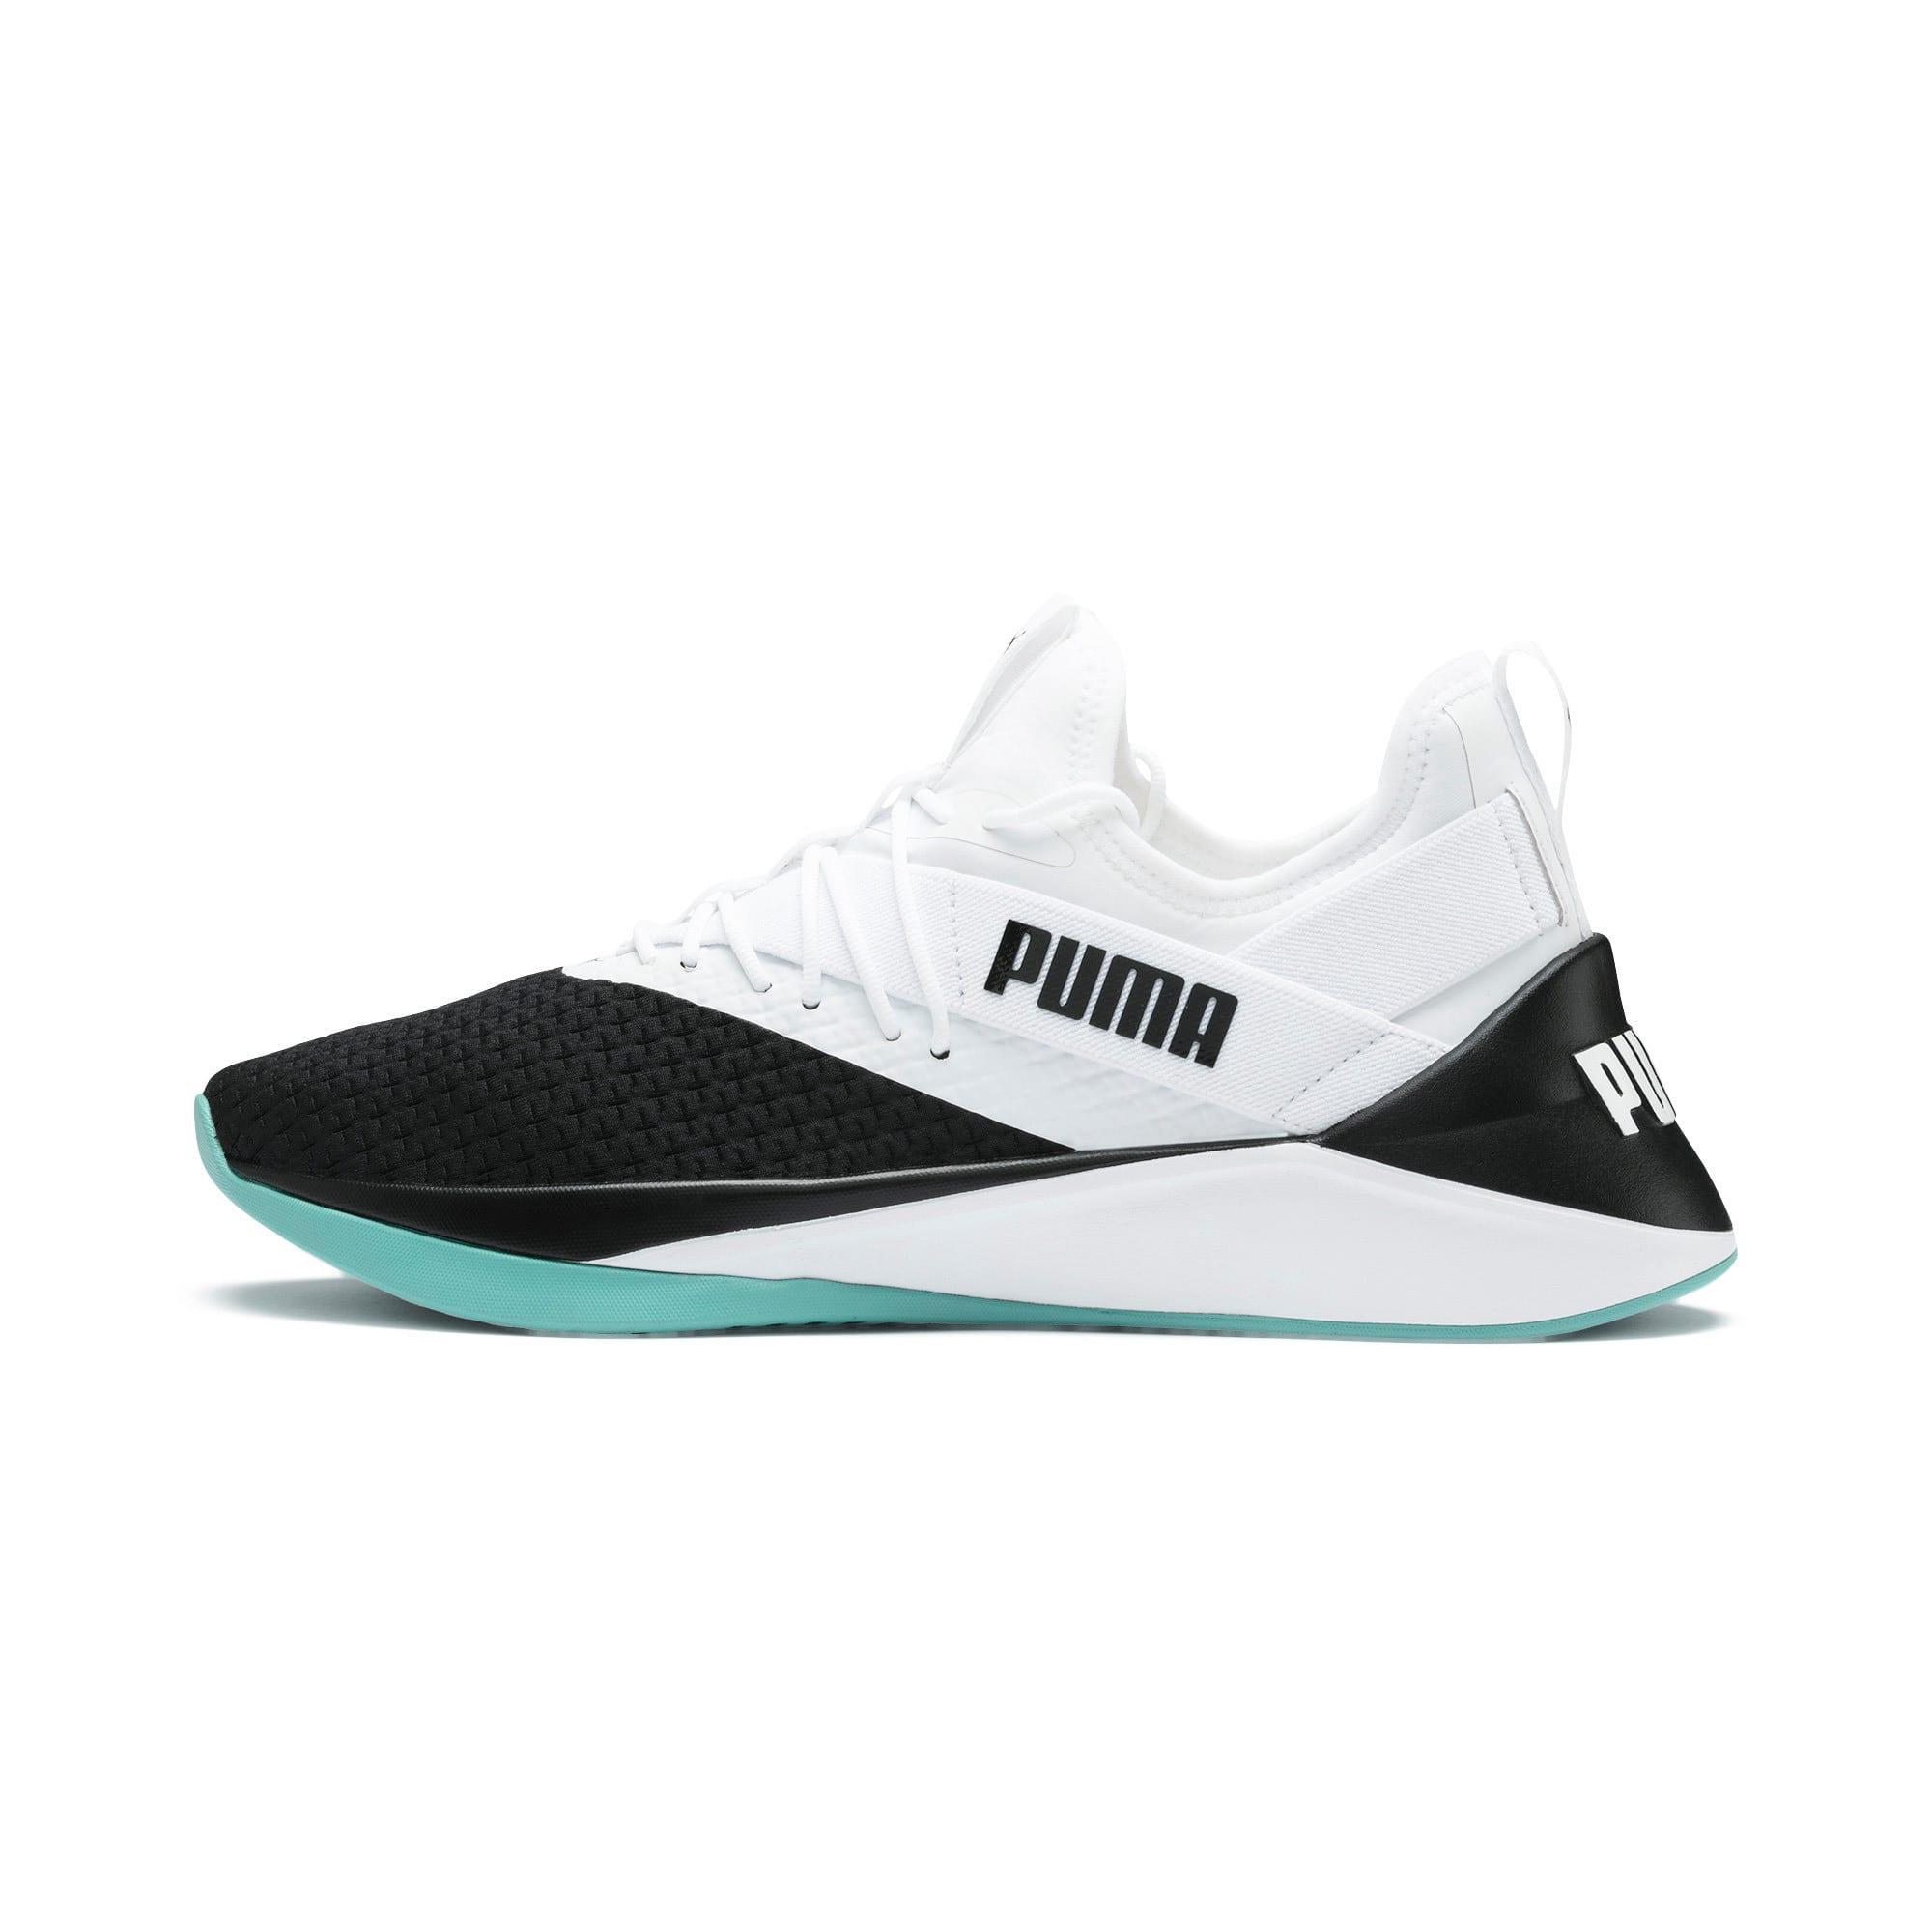 Thumbnail 1 of Jaab XT Men's Trainers, Puma White-Puma Black -1, medium